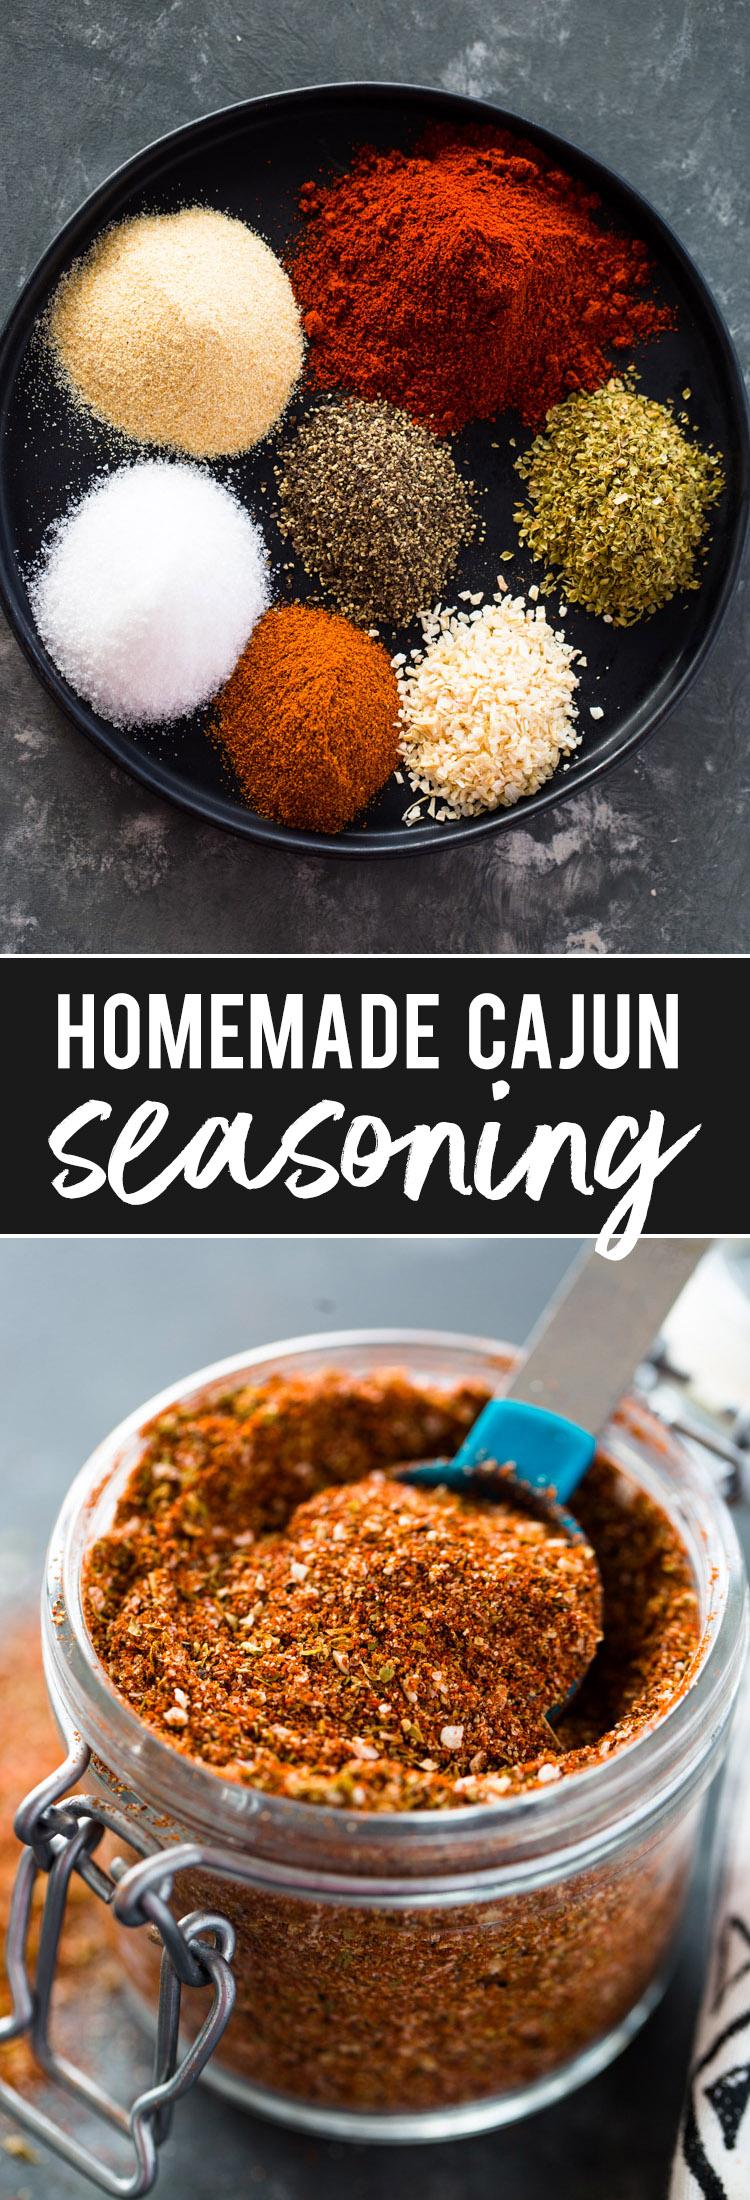 Cajun Seasoning Spice Mix